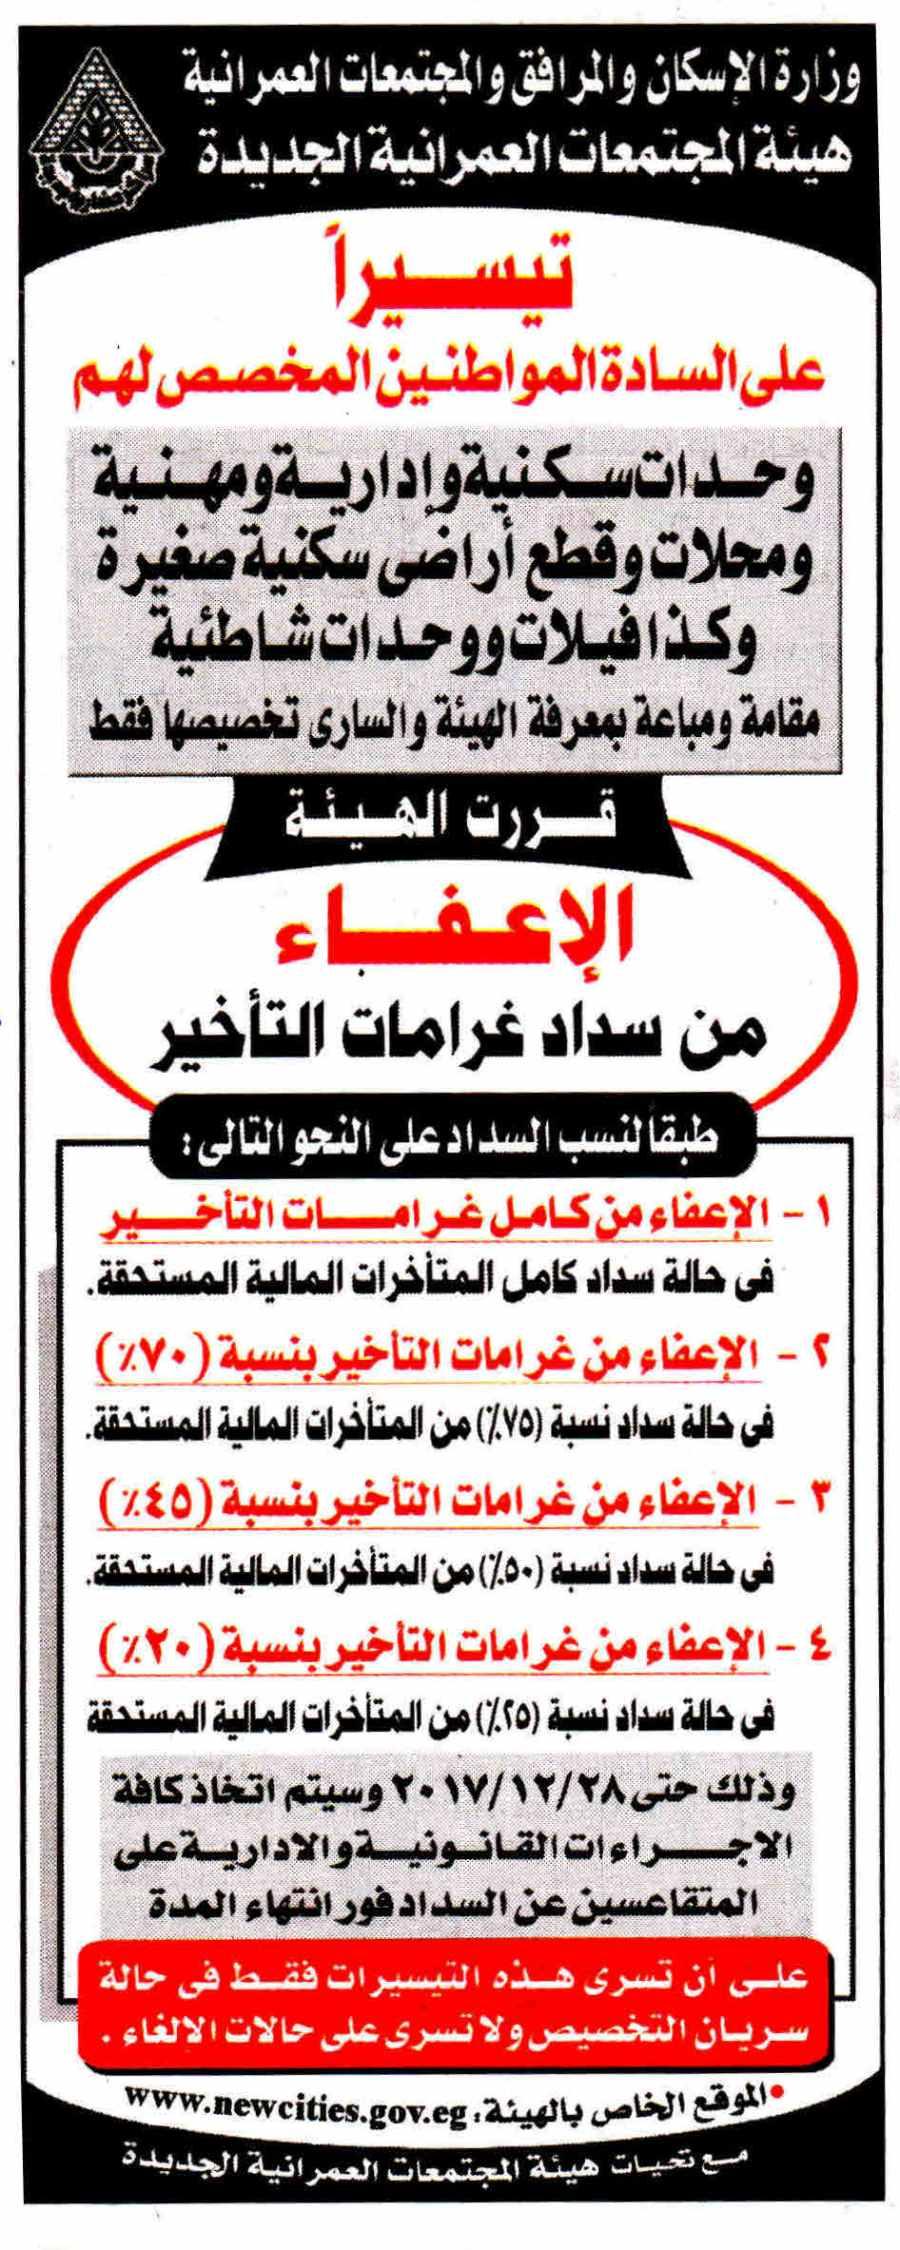 Al Akhbar 12 Sep P.1.jpg